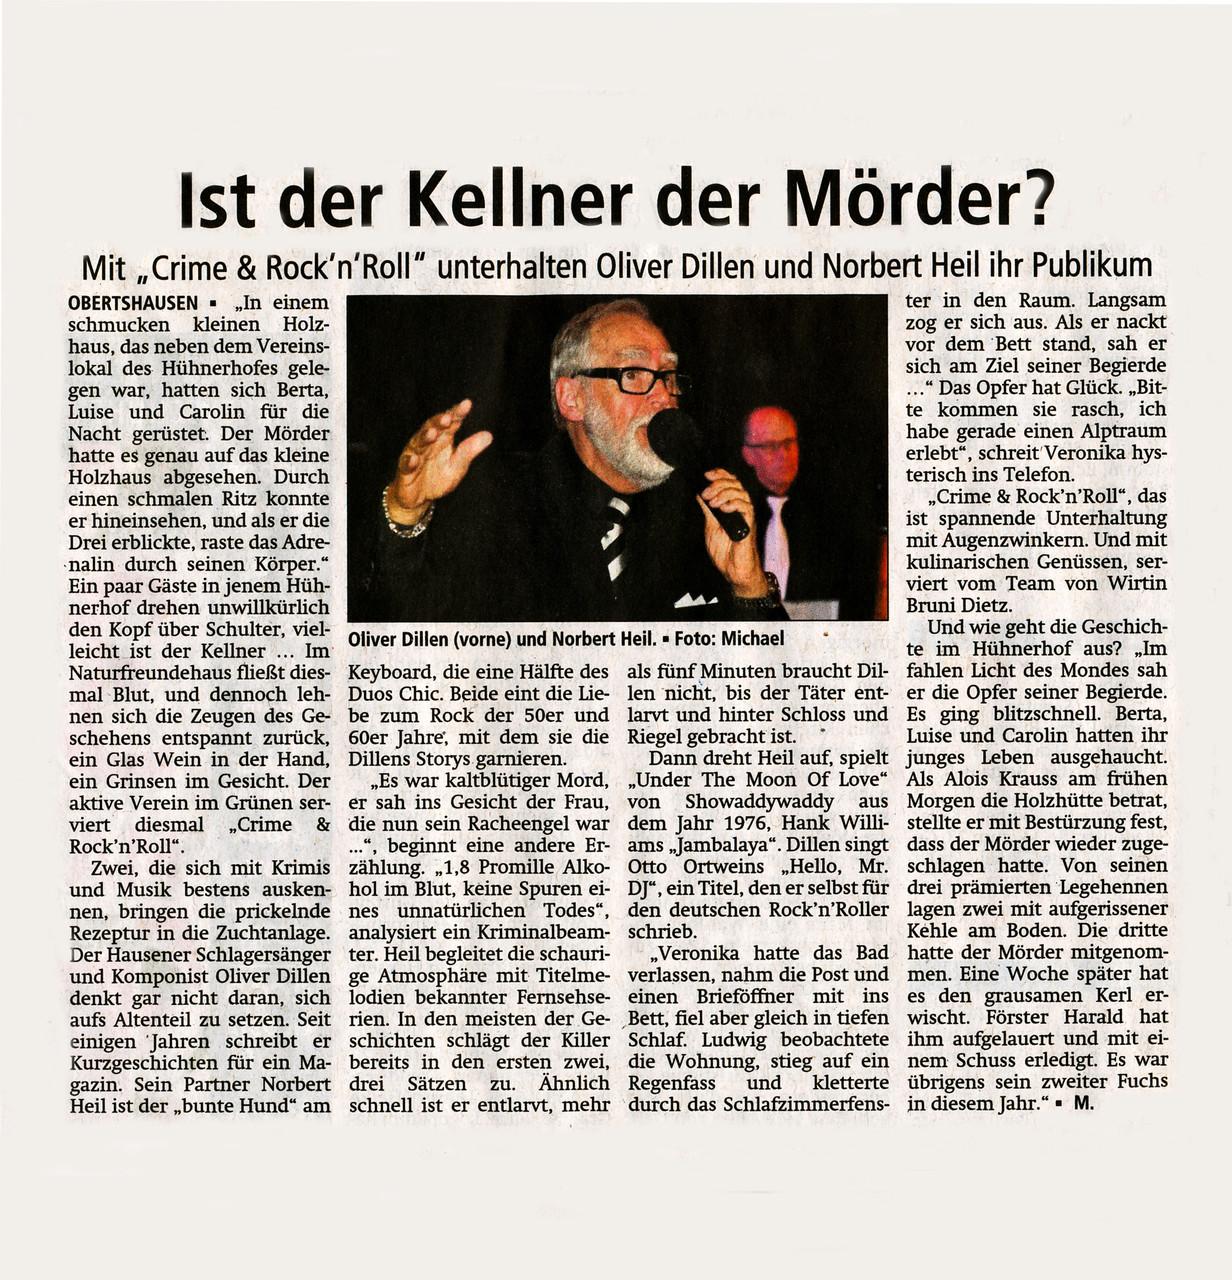 Offenbach Post, 25. April 2015